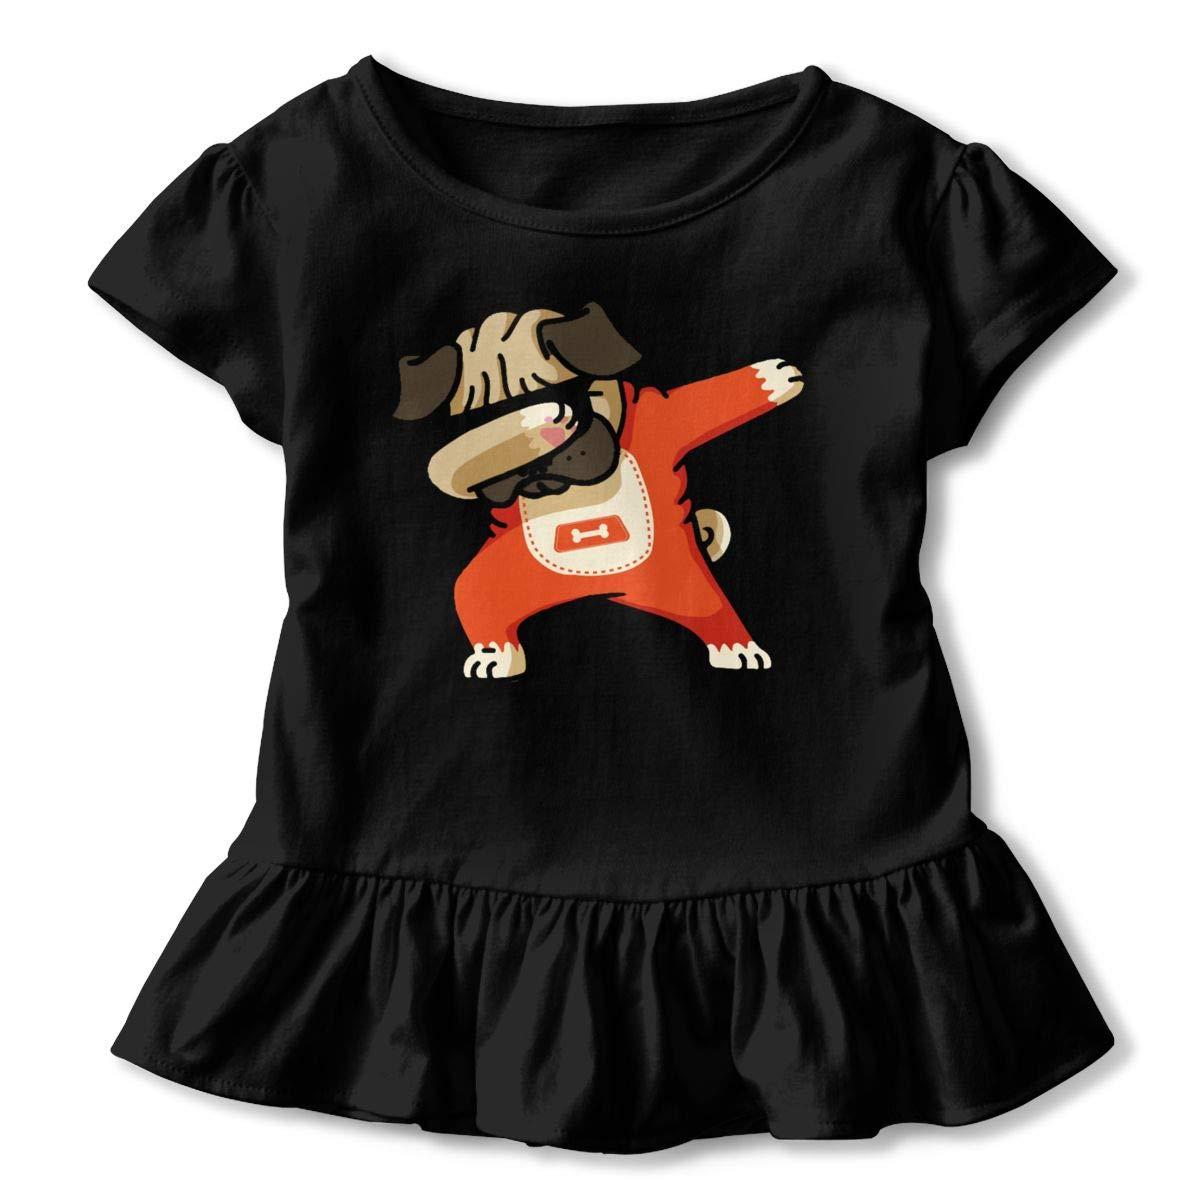 JVNSS Pug Dab Shirt Fashion Baby Girl Flounced T Shirts Graphic Tees for 2-6T Kids Girls